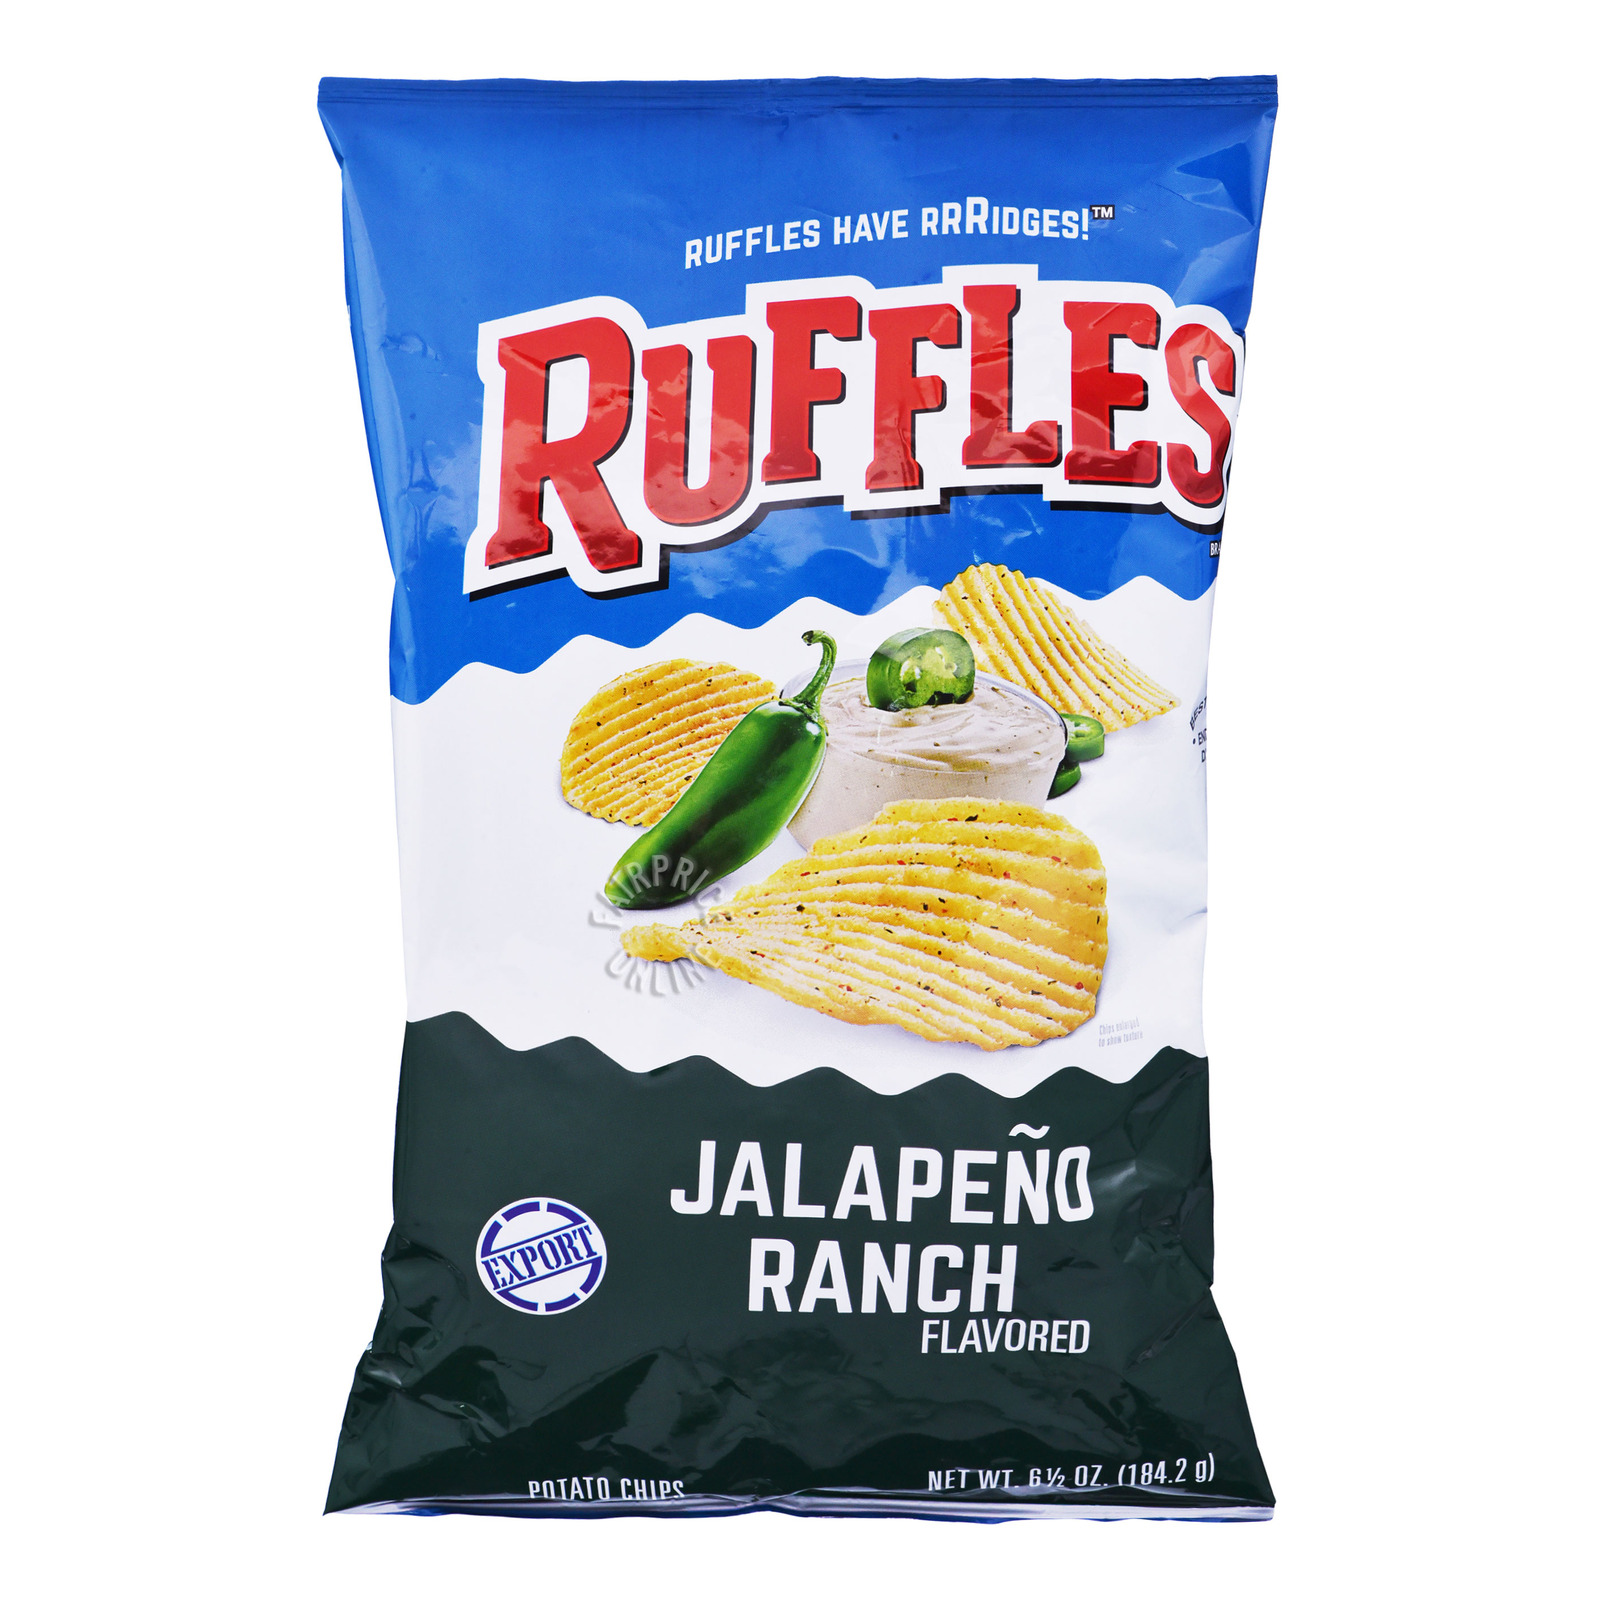 Ruffles Potato Chips - Jalapeno Ranch